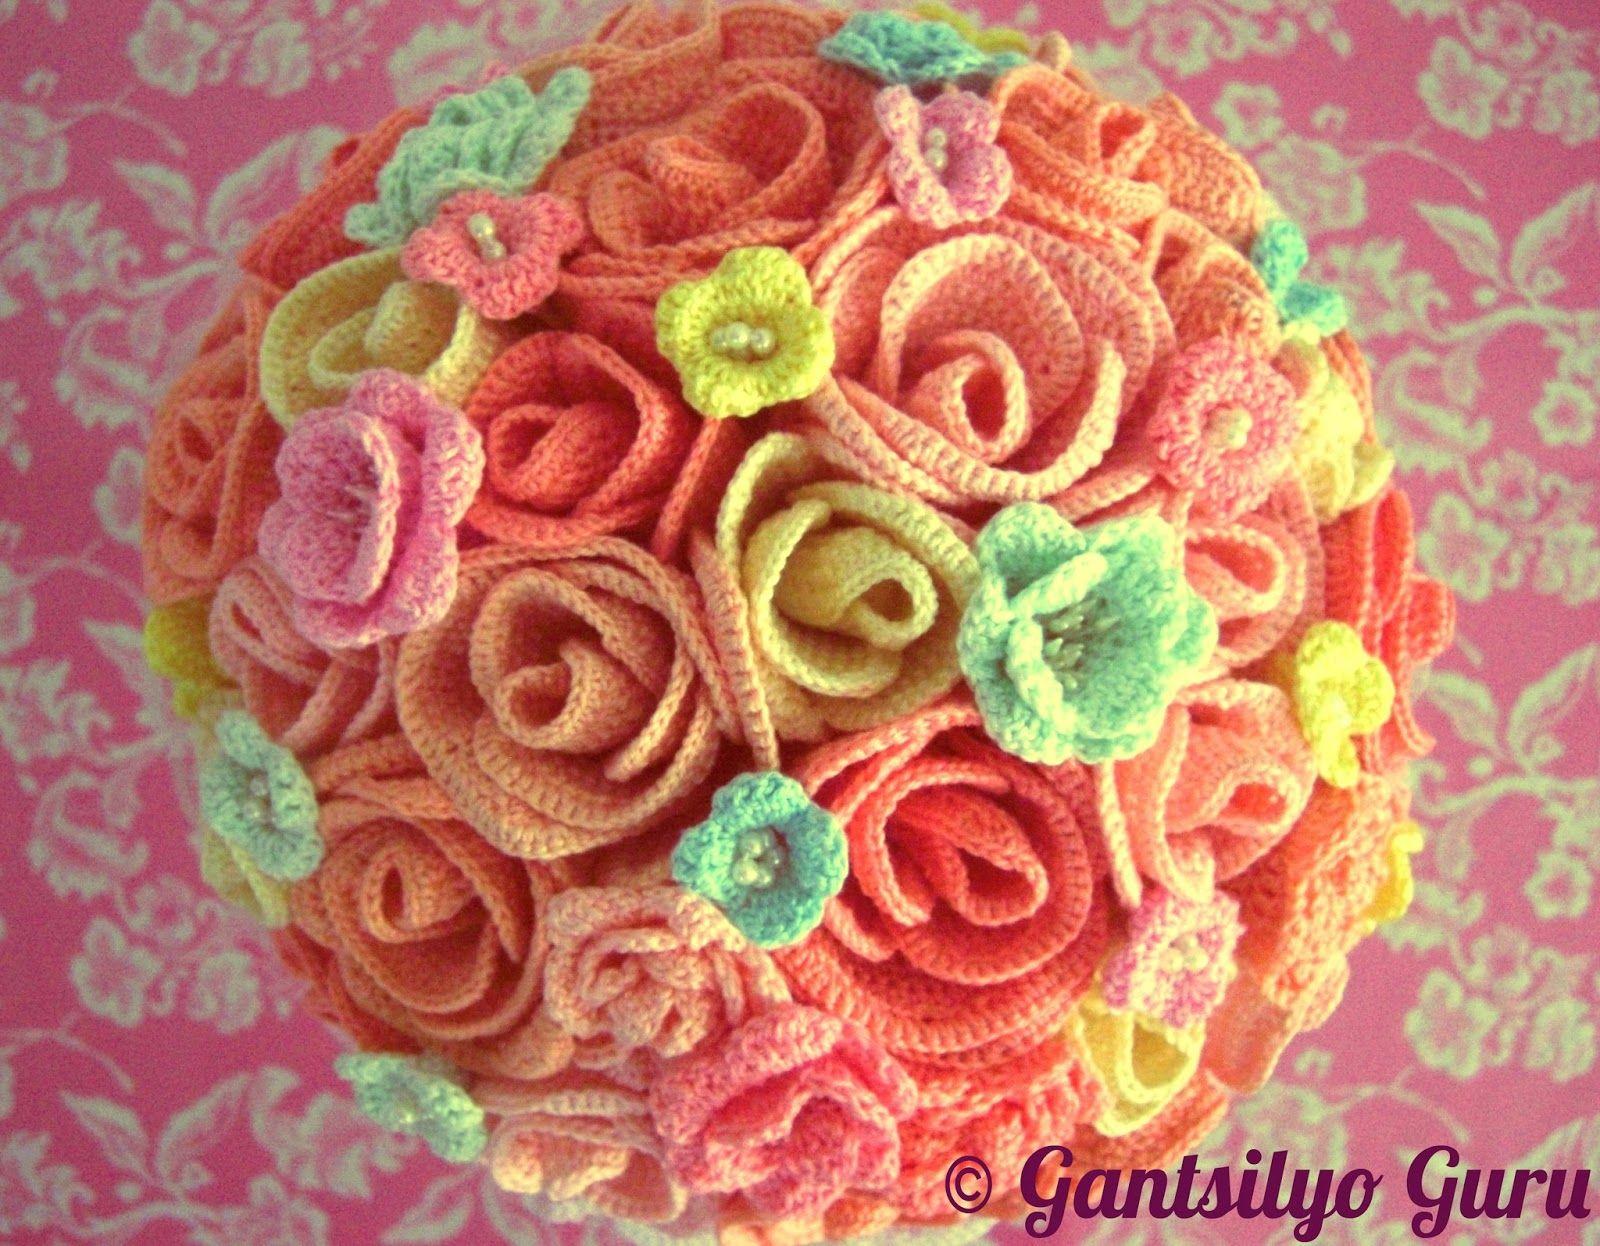 Bridal bouquet crocheted crochet flowers pinterest crochet bridal bouquet crocheted izmirmasajfo